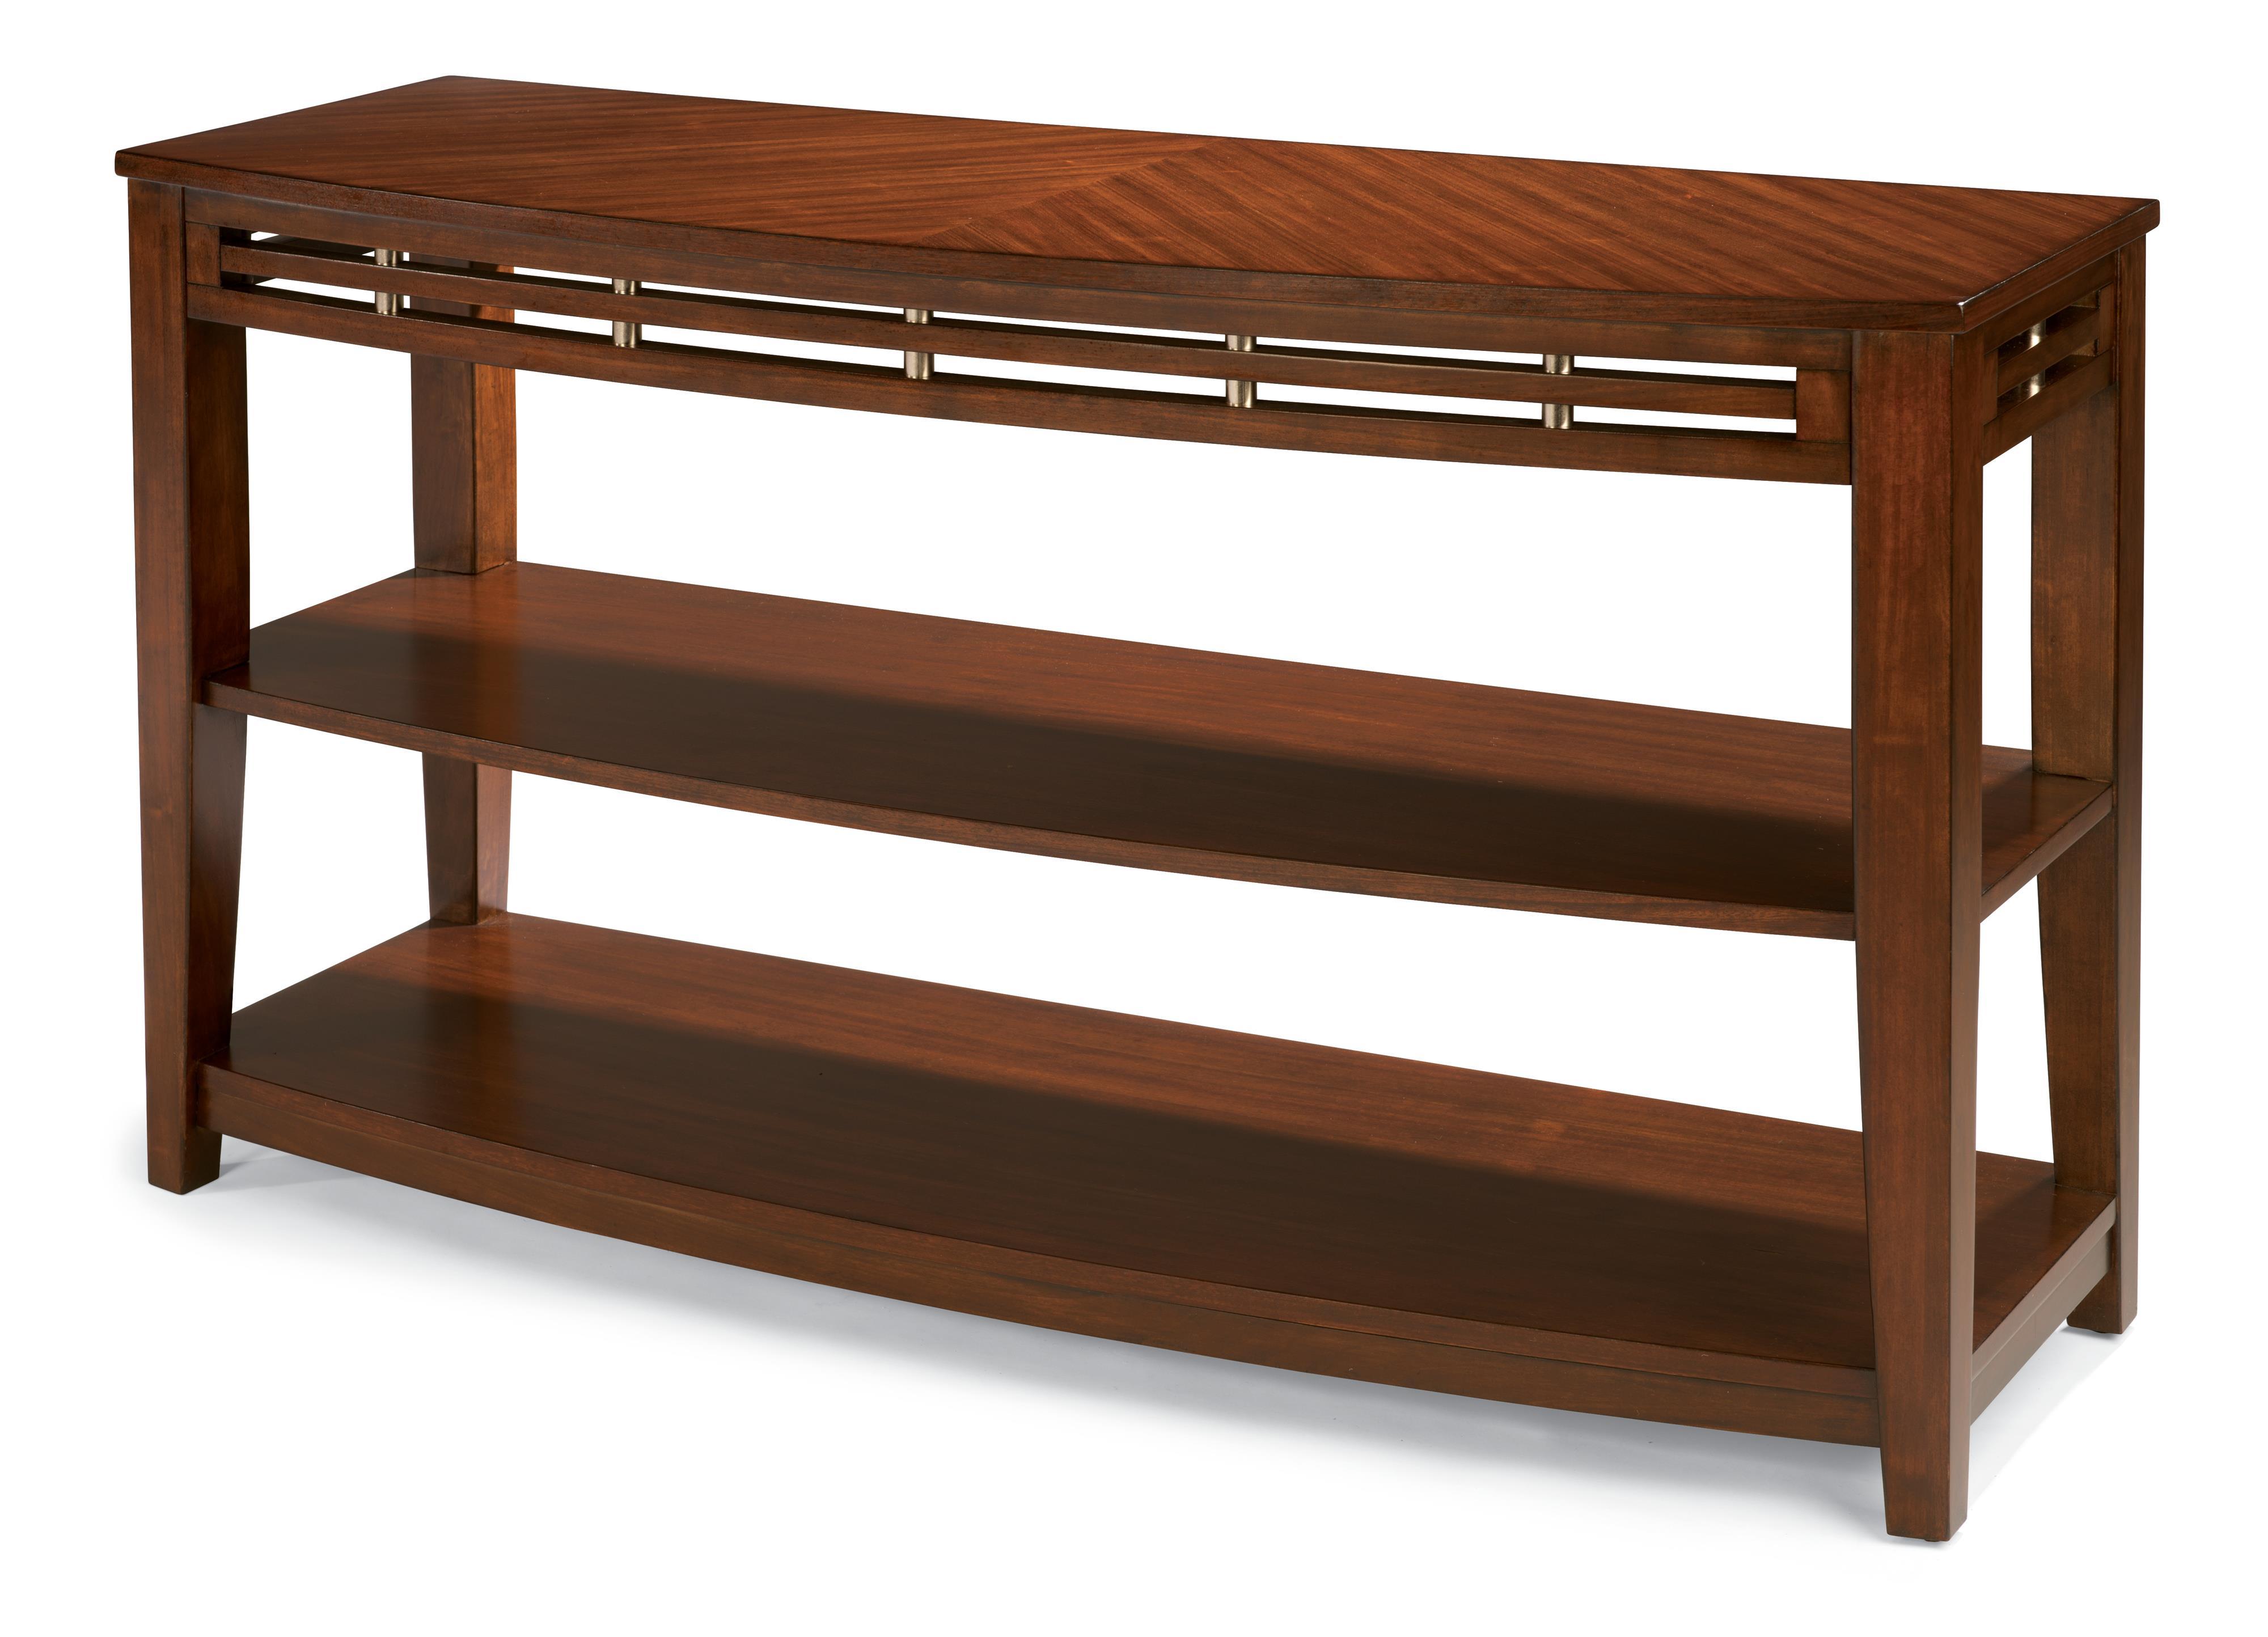 Flexsteel Bali Sofa Table - Item Number: W1409-04